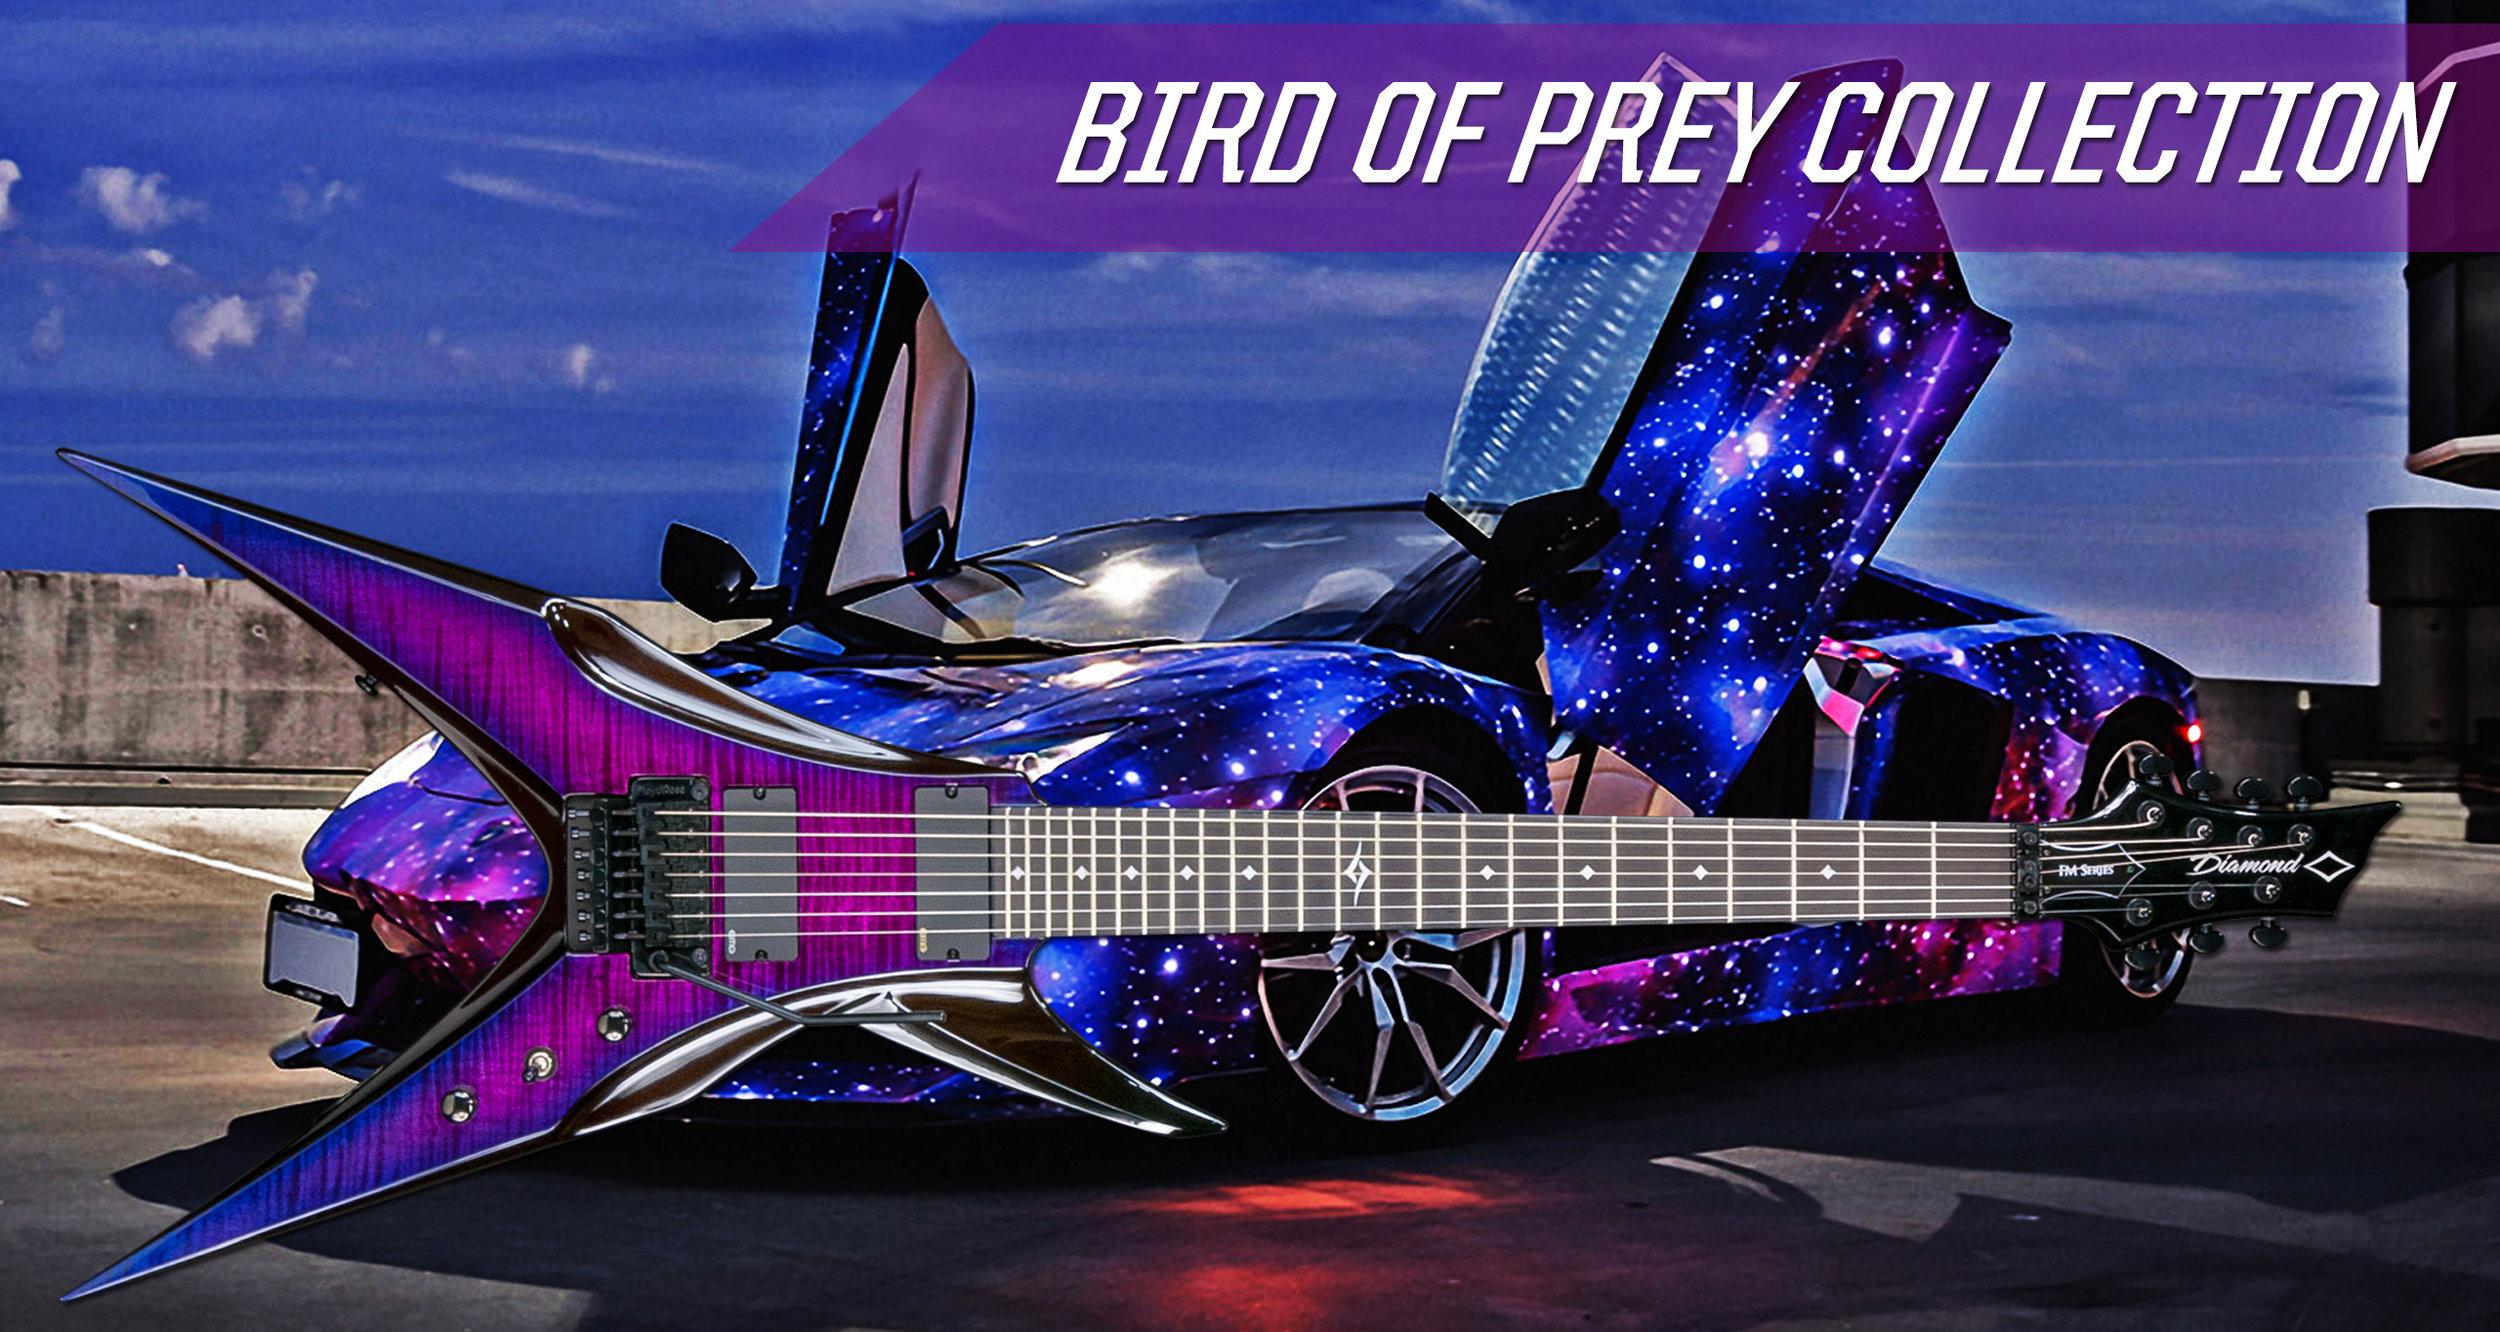 Bird Of Prey Collection Diamond Guitars